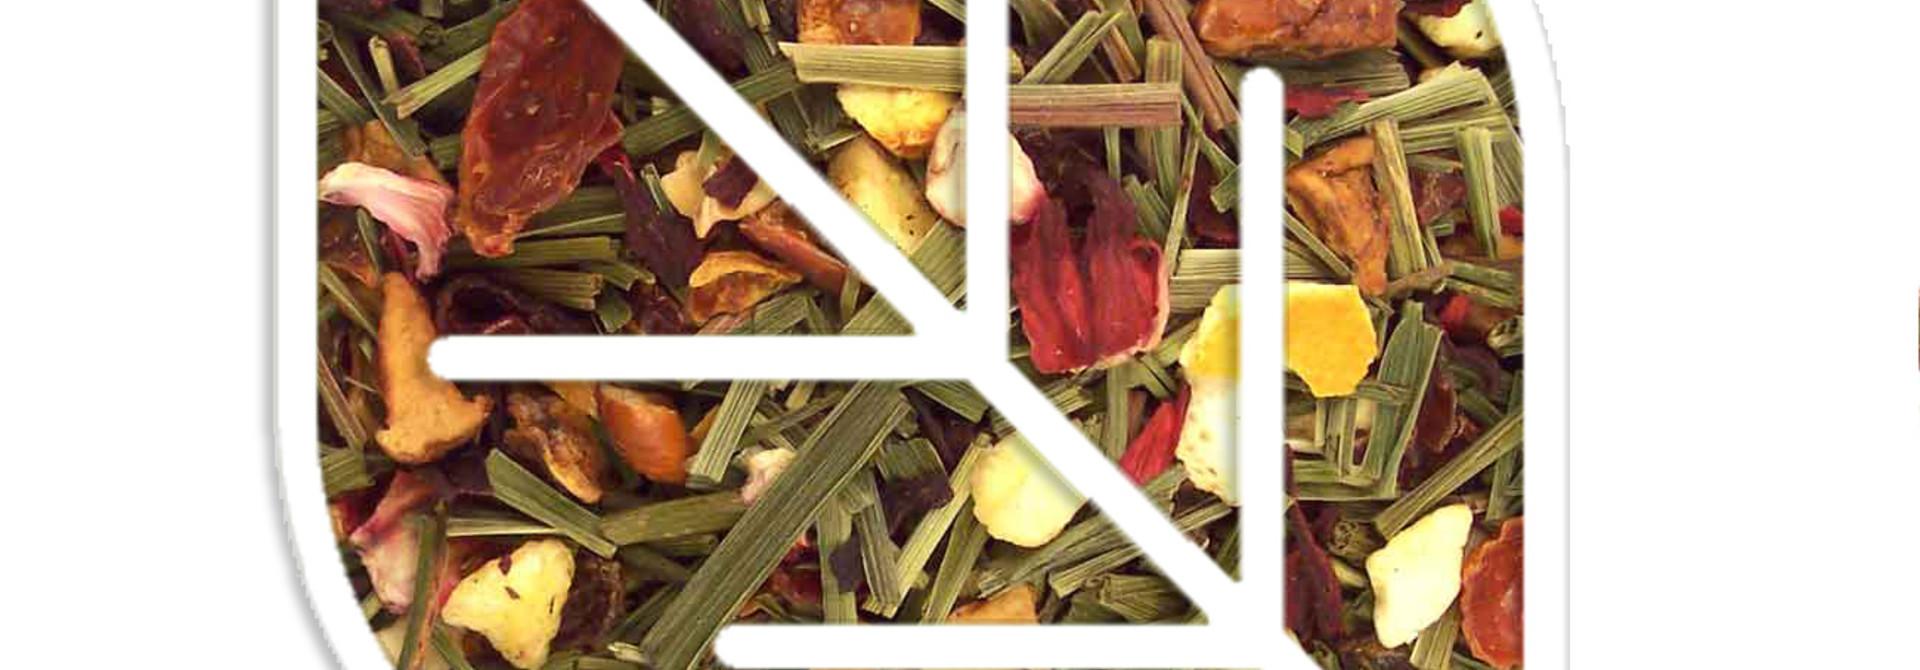 Citrus betovering Vruchten thee